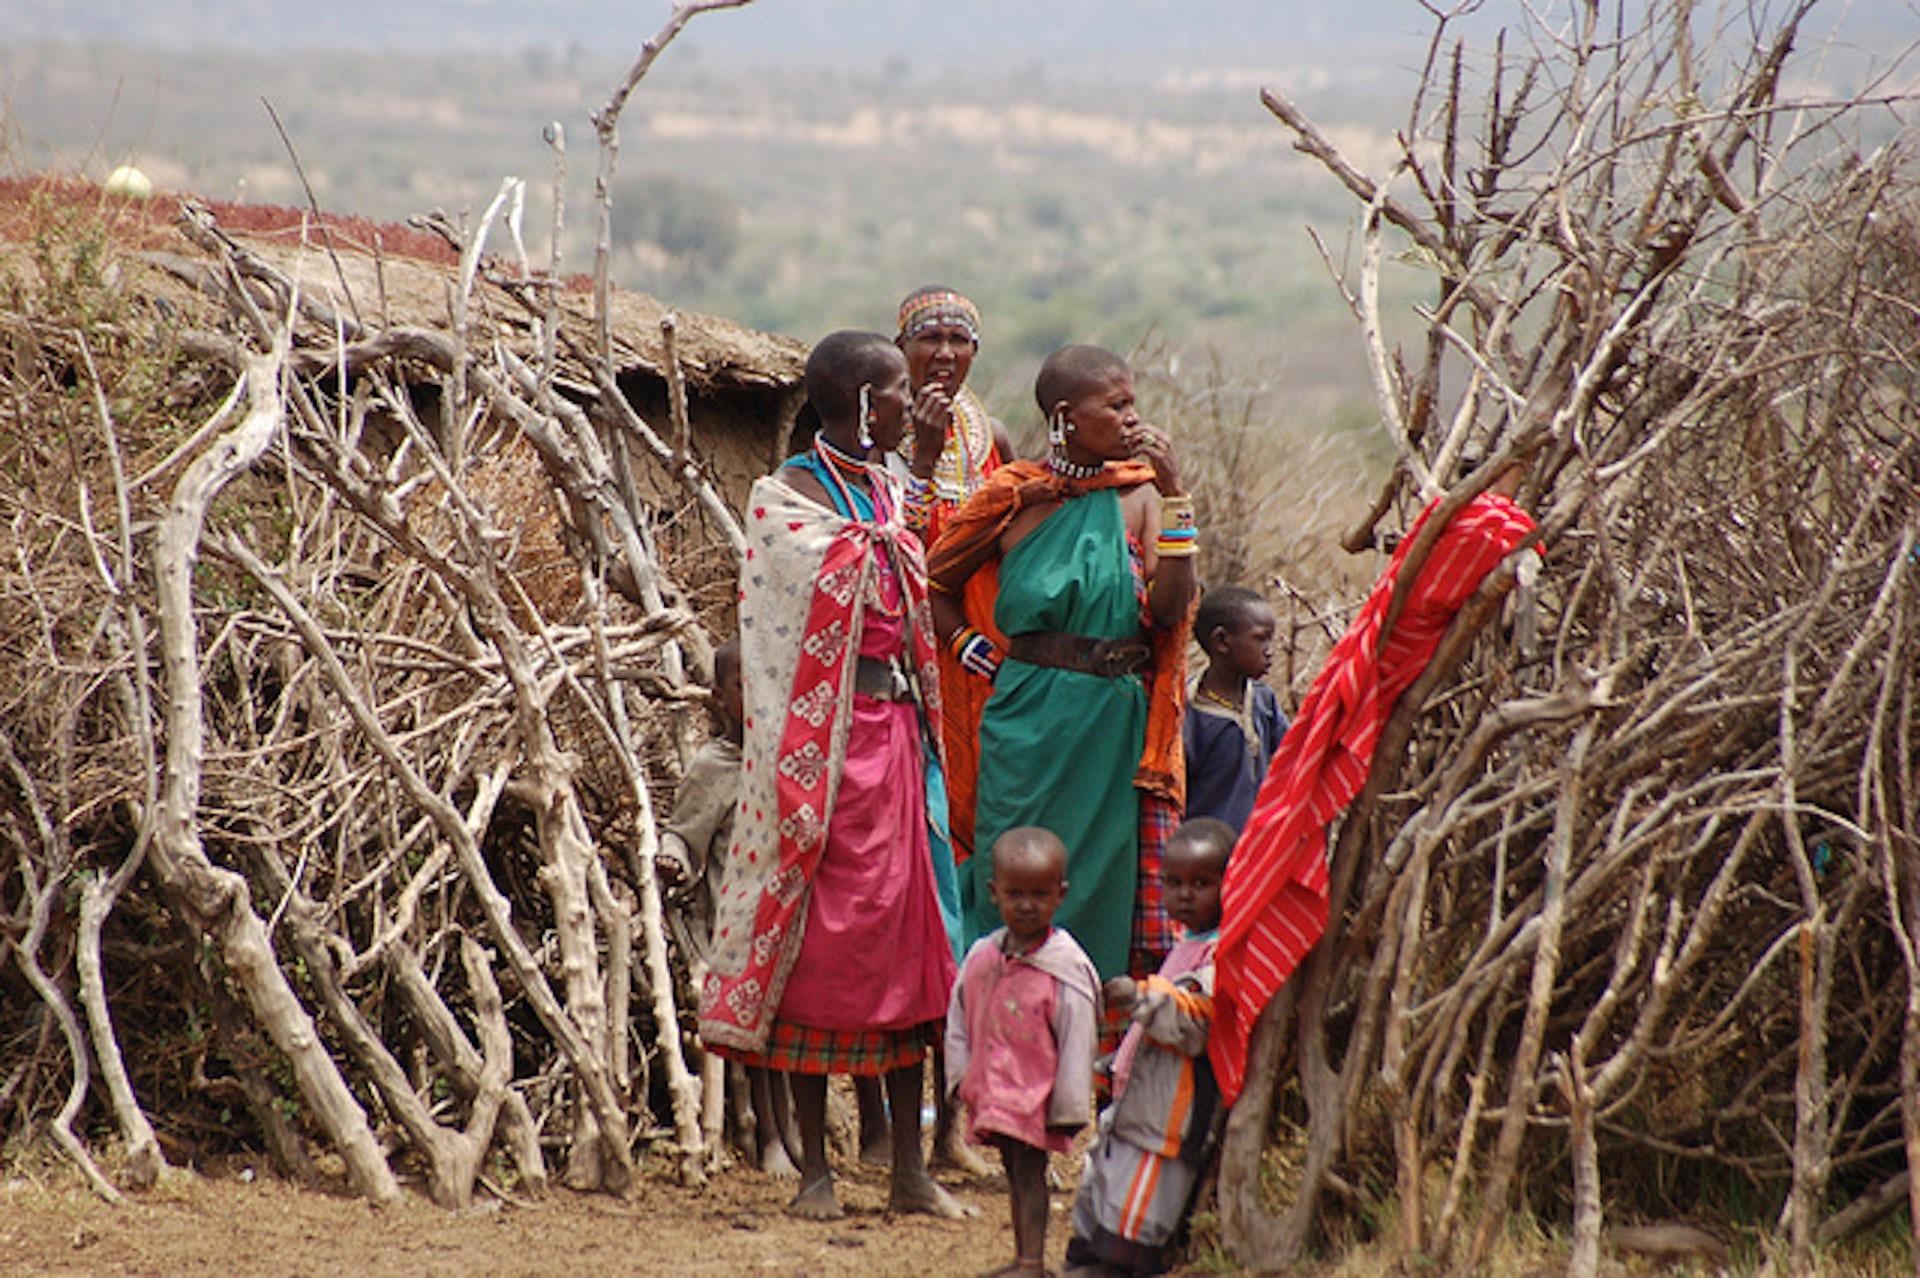 file 20180626 112614 1quncax.jpg?ixlib=rb 1.1 - Why Maasai women and their children go hungry